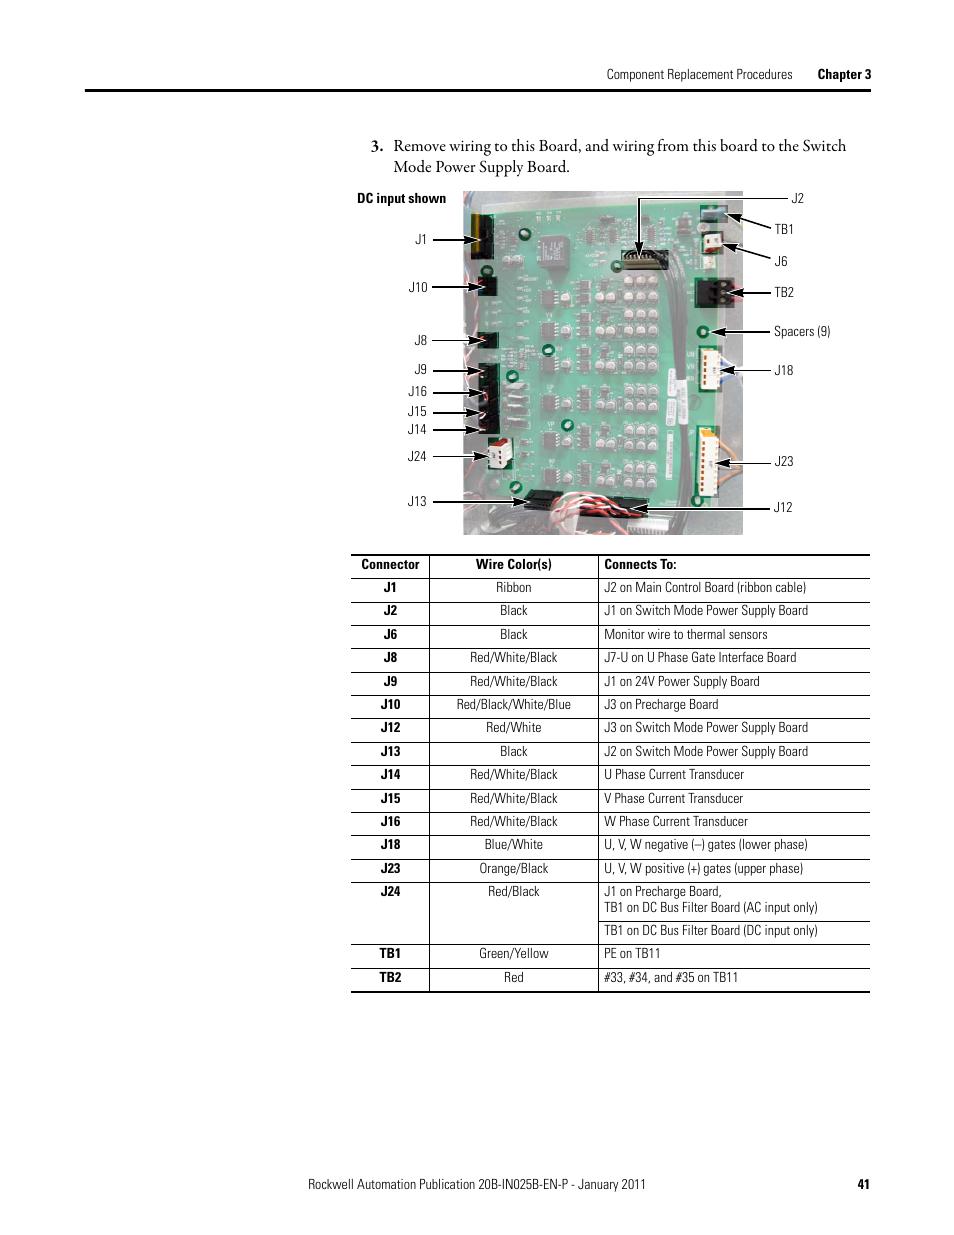 rockwell automation pf700 powerflex 700 drive components replacement rh manualsdir com powerflex 700 user manual pdf allen bradley powerflex 700 user manual